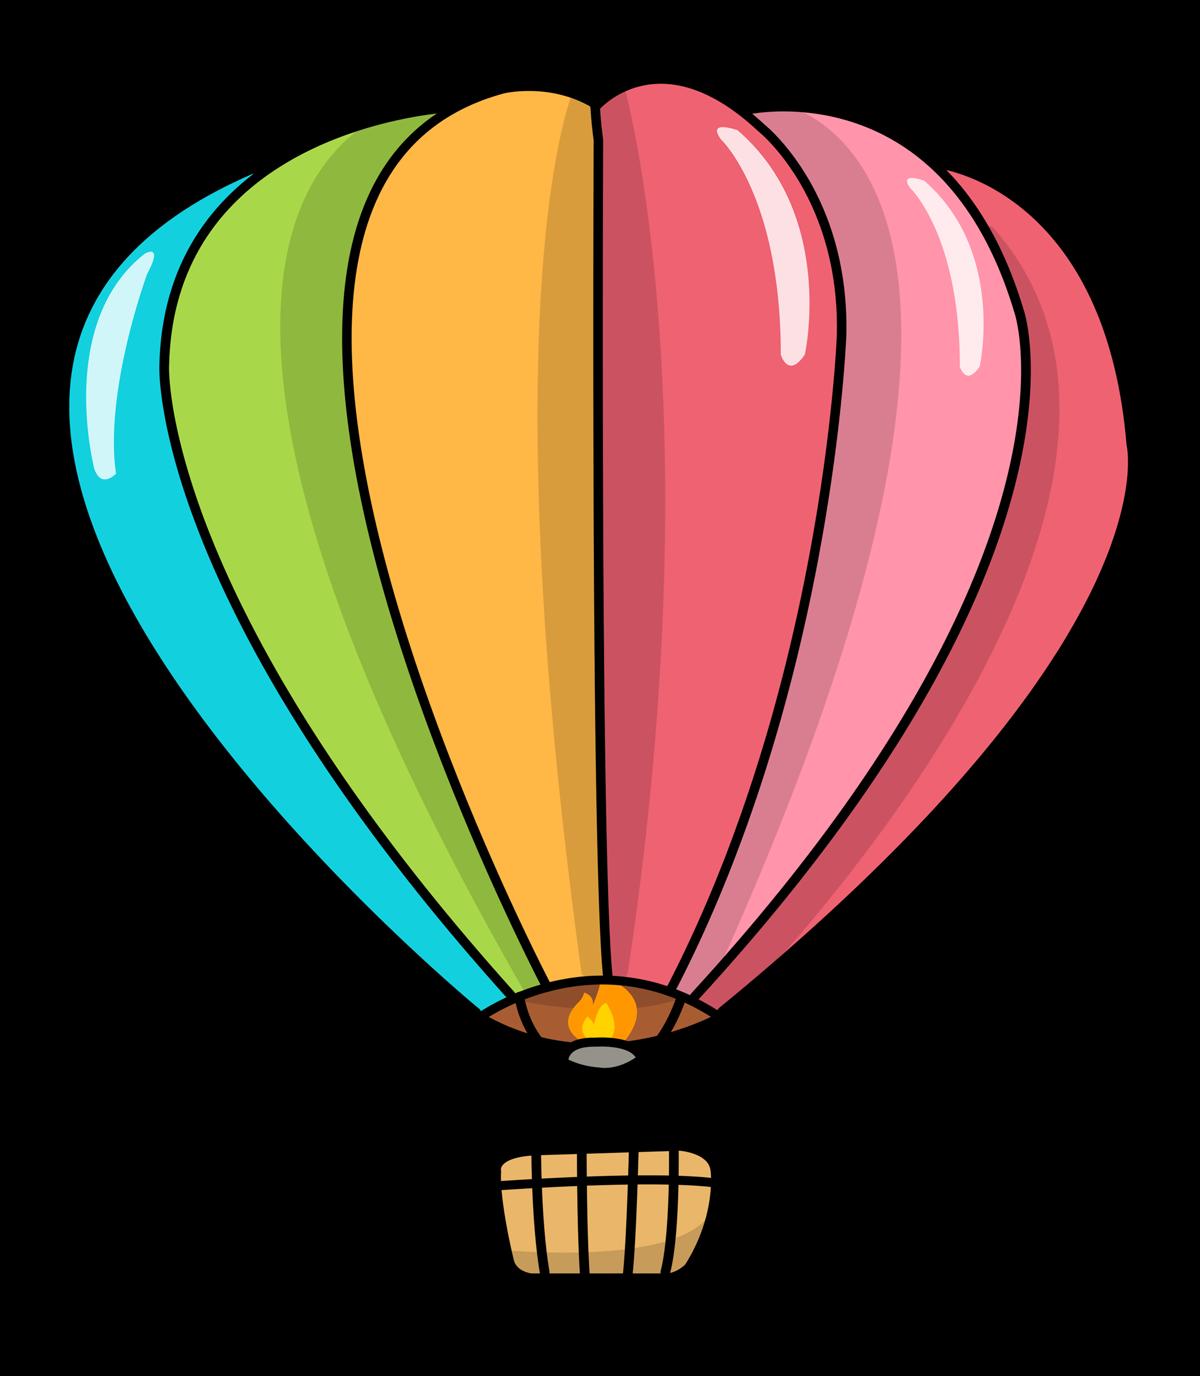 Hot Air Balloon clipart #18, Download drawings